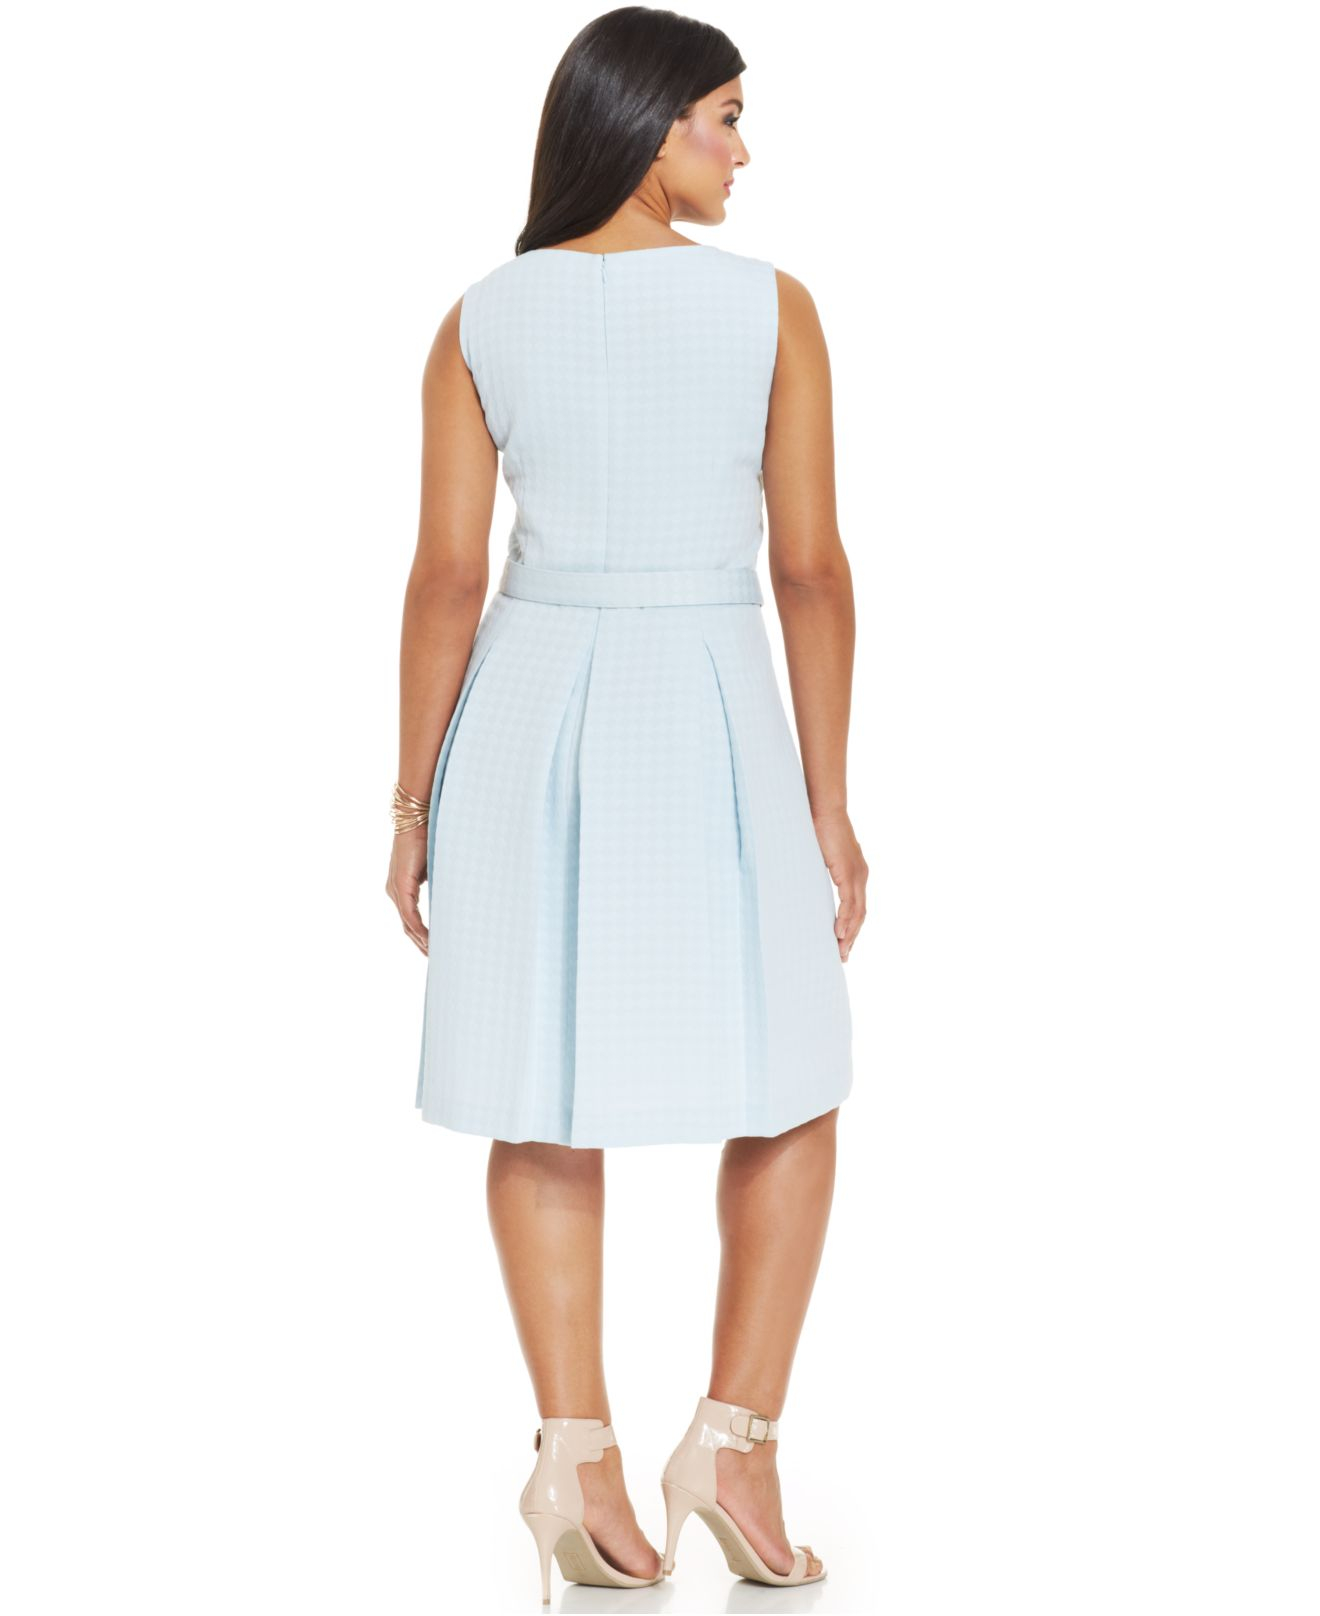 Tahari Asl Plus Size Jacquard Pleated Dress In Ice Blue